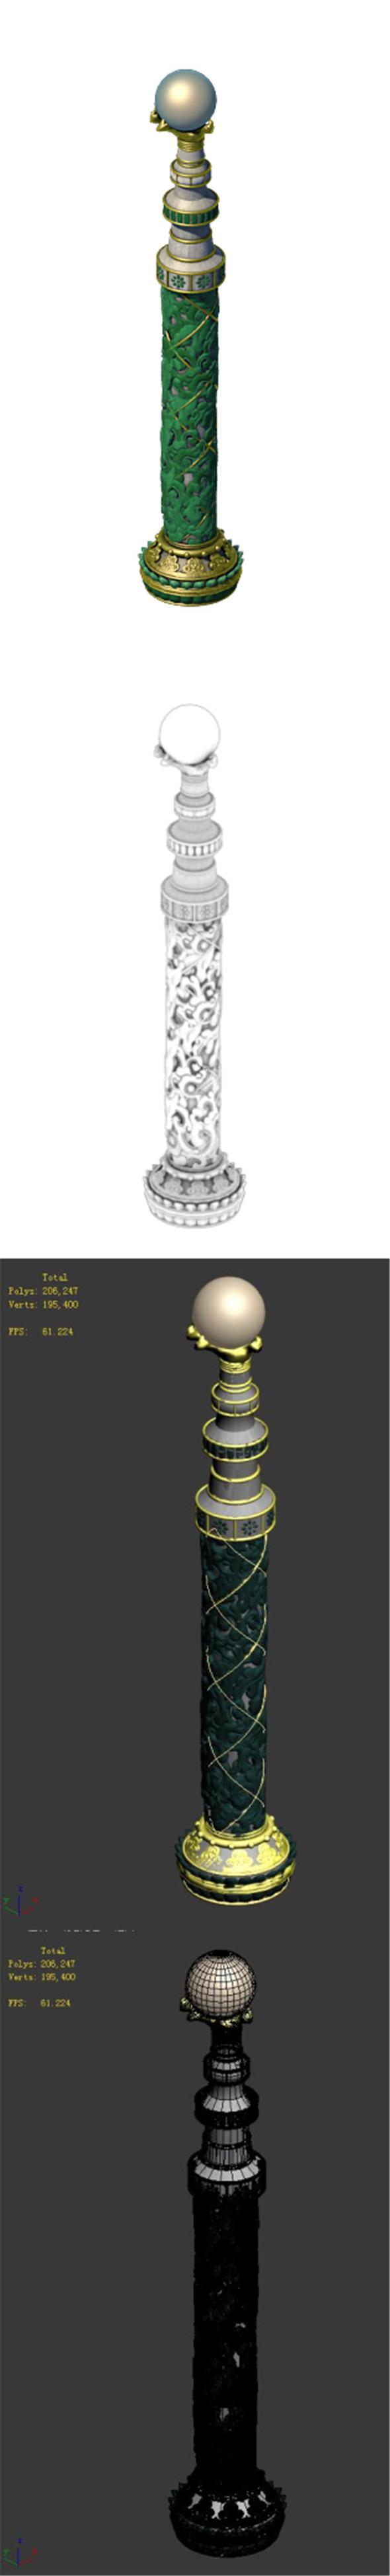 Wonderful fantasy - decorative pillars 02 - 3DOcean Item for Sale